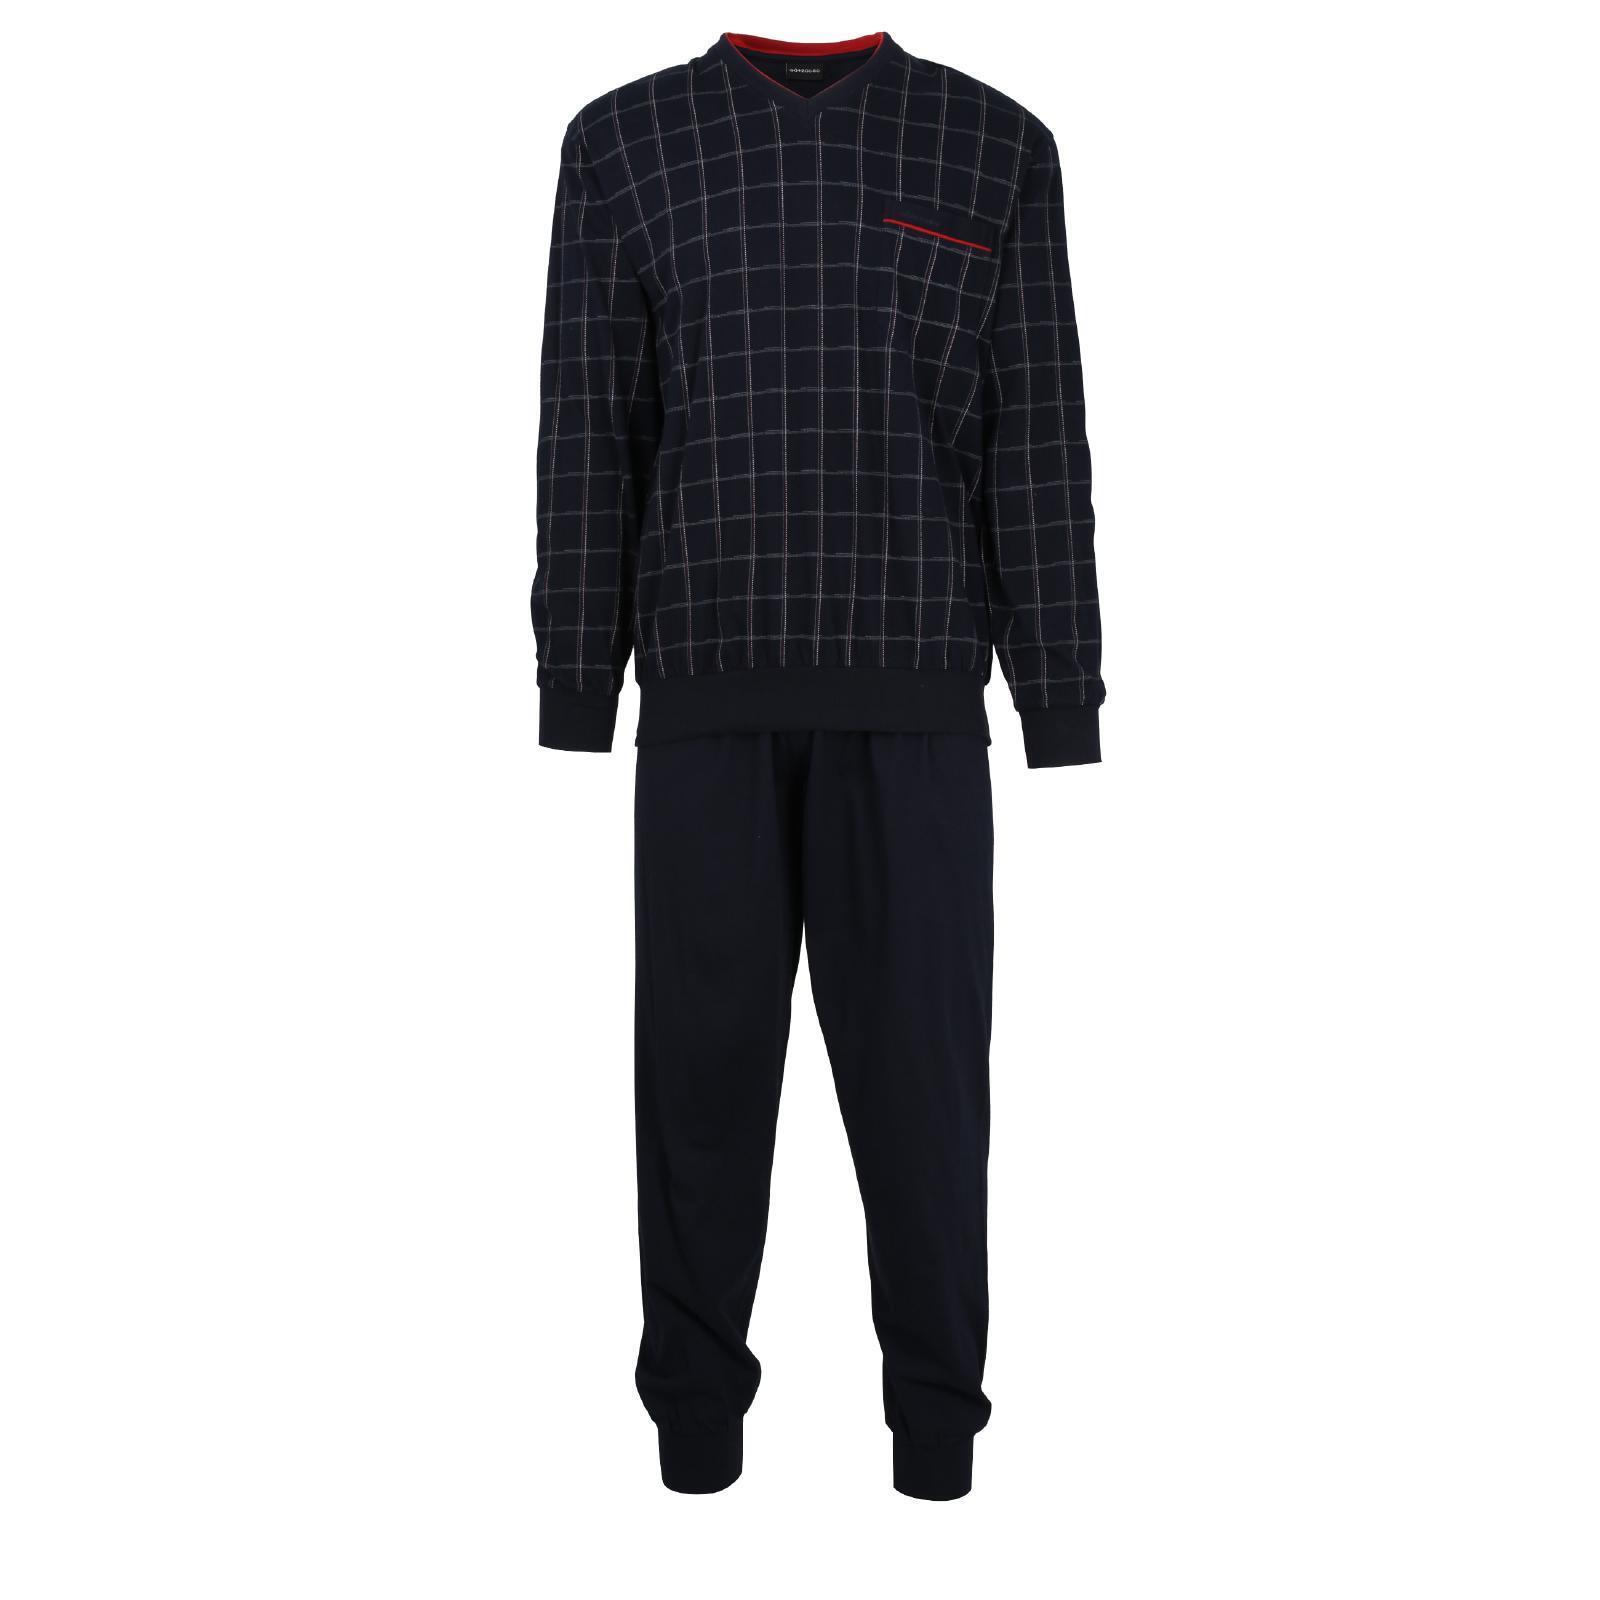 Götzburg Pyjama Schlafanzug lang  Gr. 48 navy  Bündchen Single Jersey V-Ausschn.